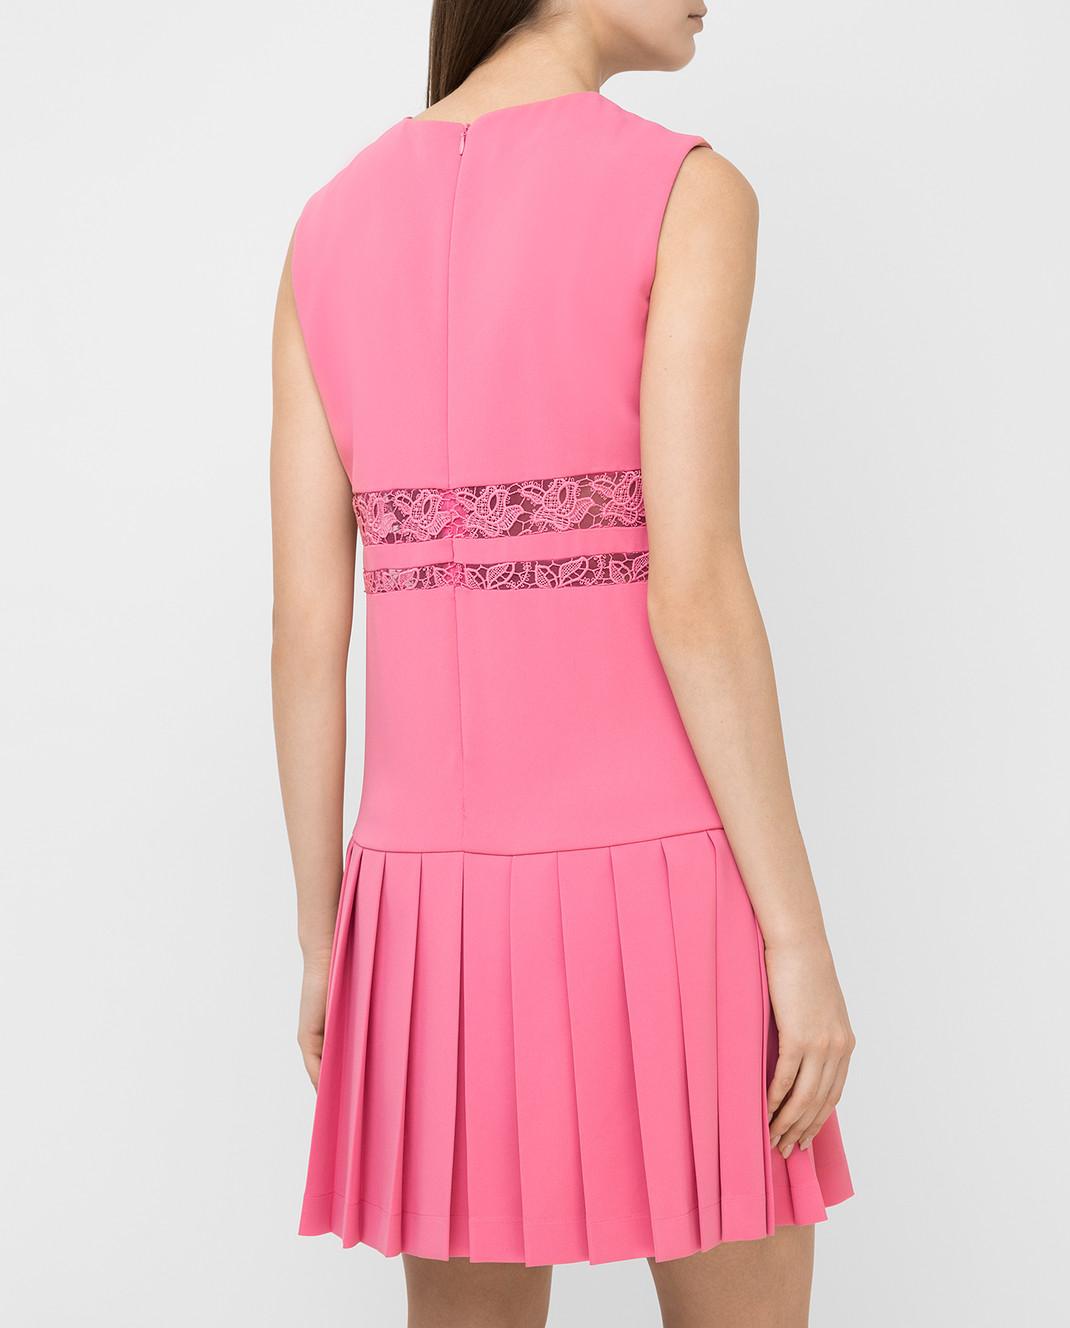 Ermanno Scervino Розовое платье изображение 4